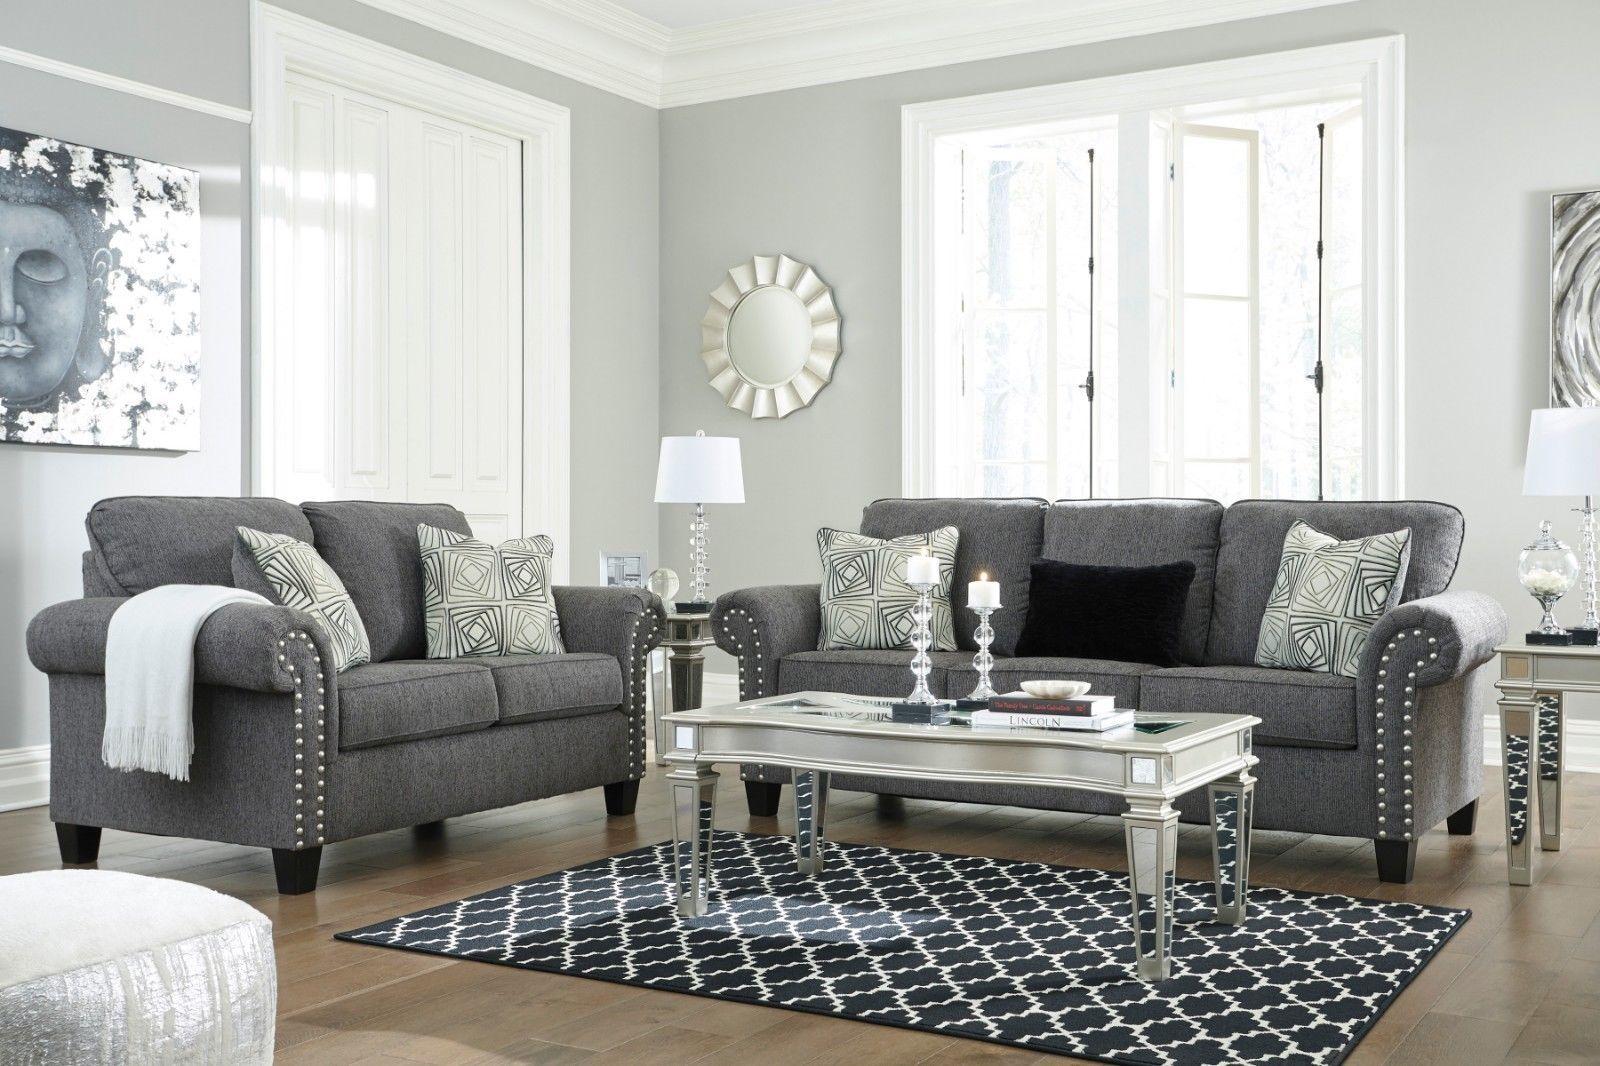 850 00 Ashley Furniture Agleno Sofa And Loveseat Living Room Set Ashley Furniture Agleno Loveseat Furniture Charcoal Living Rooms Living Room Sets